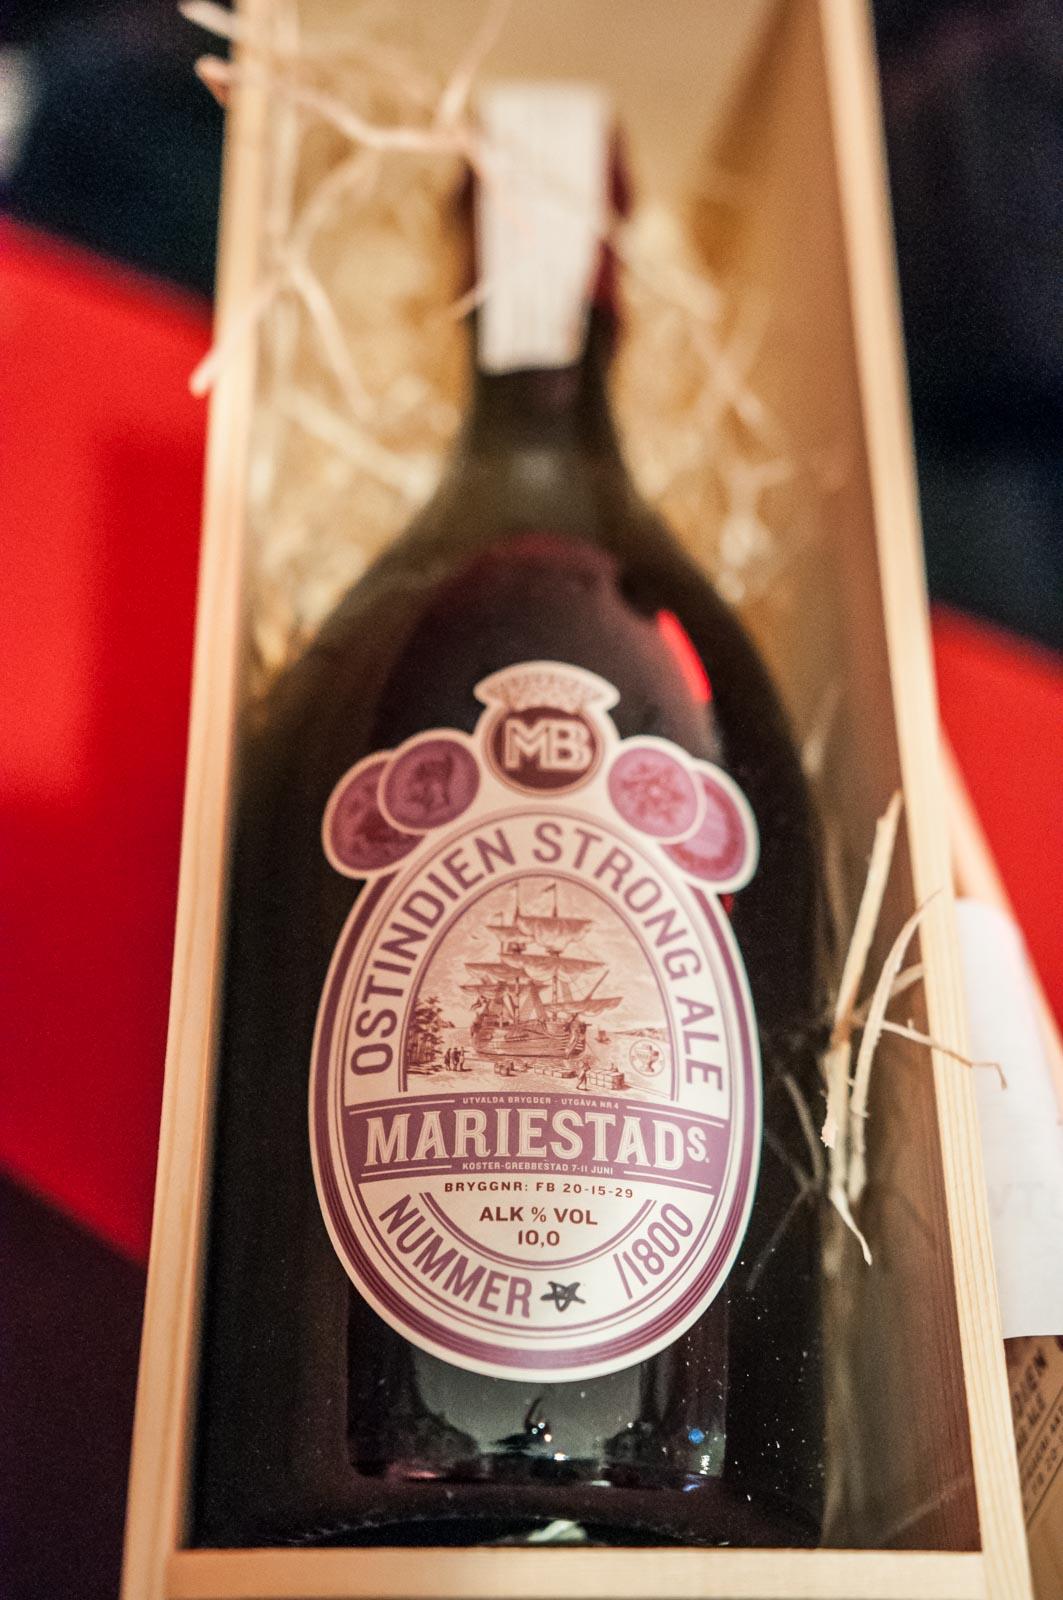 Mariestads Ostindien Strong Ale